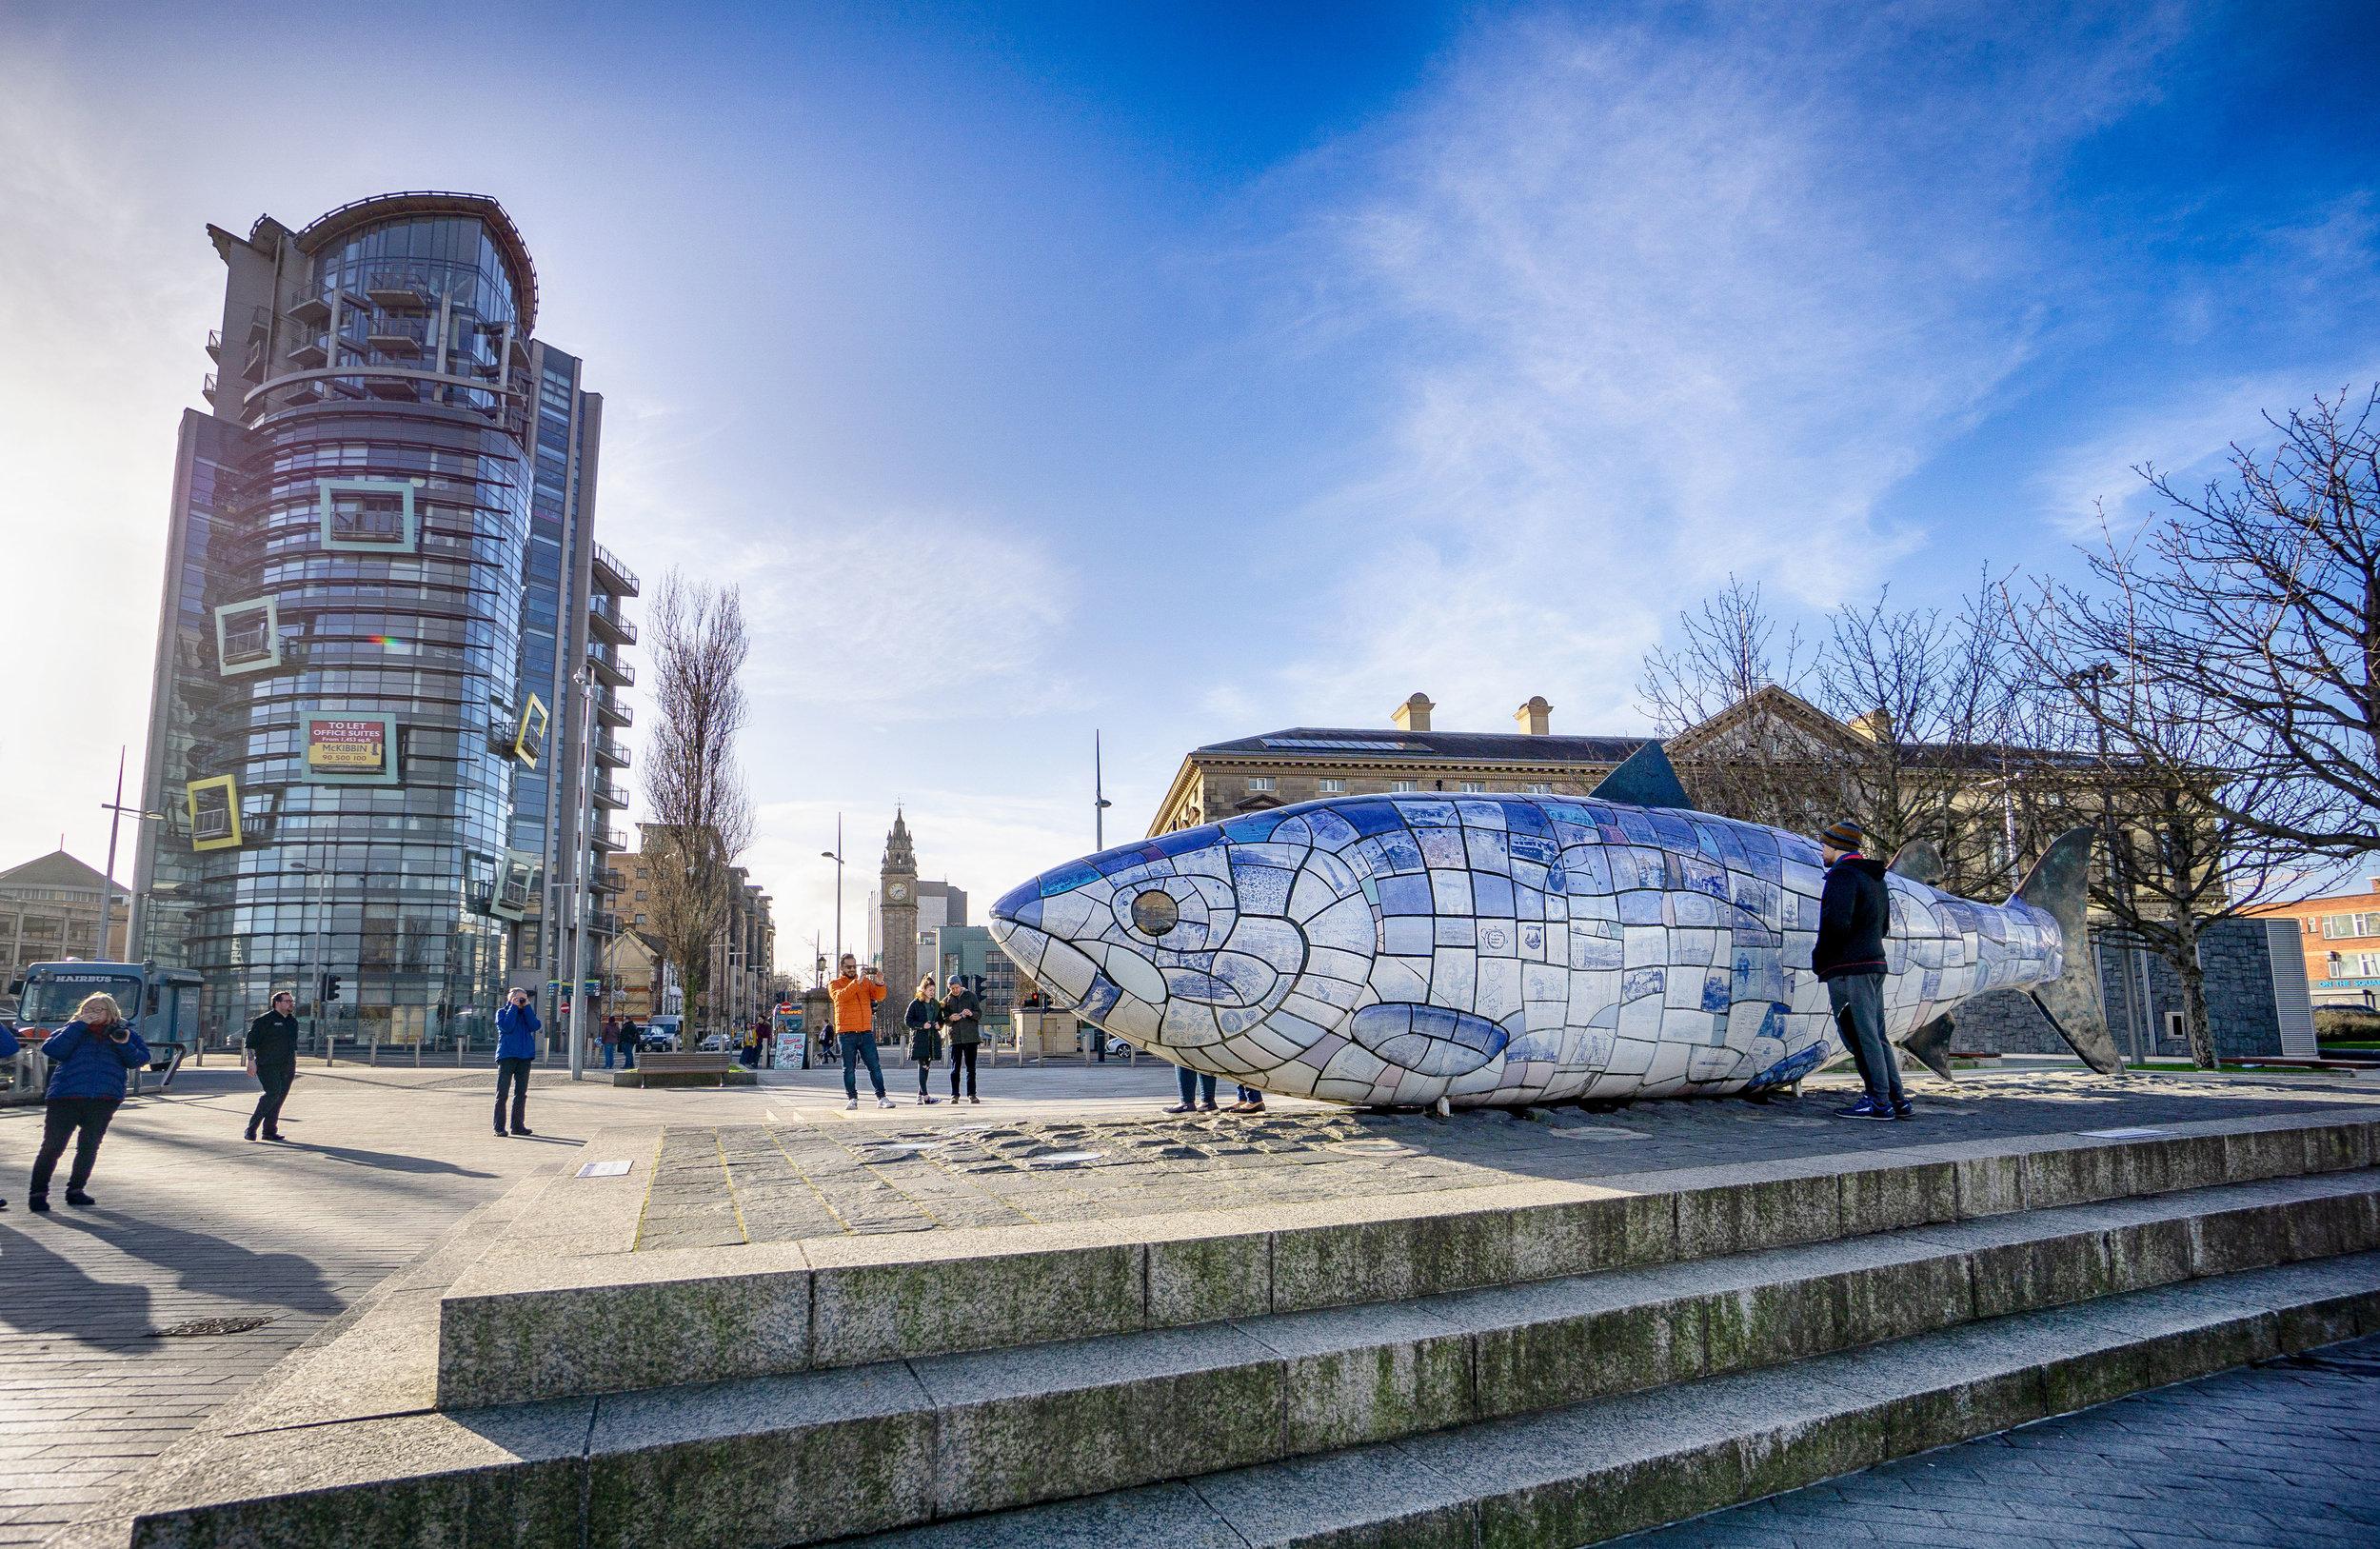 belfast_salmon_of_knoledge_vickygood_travel_photography2sm.jpg